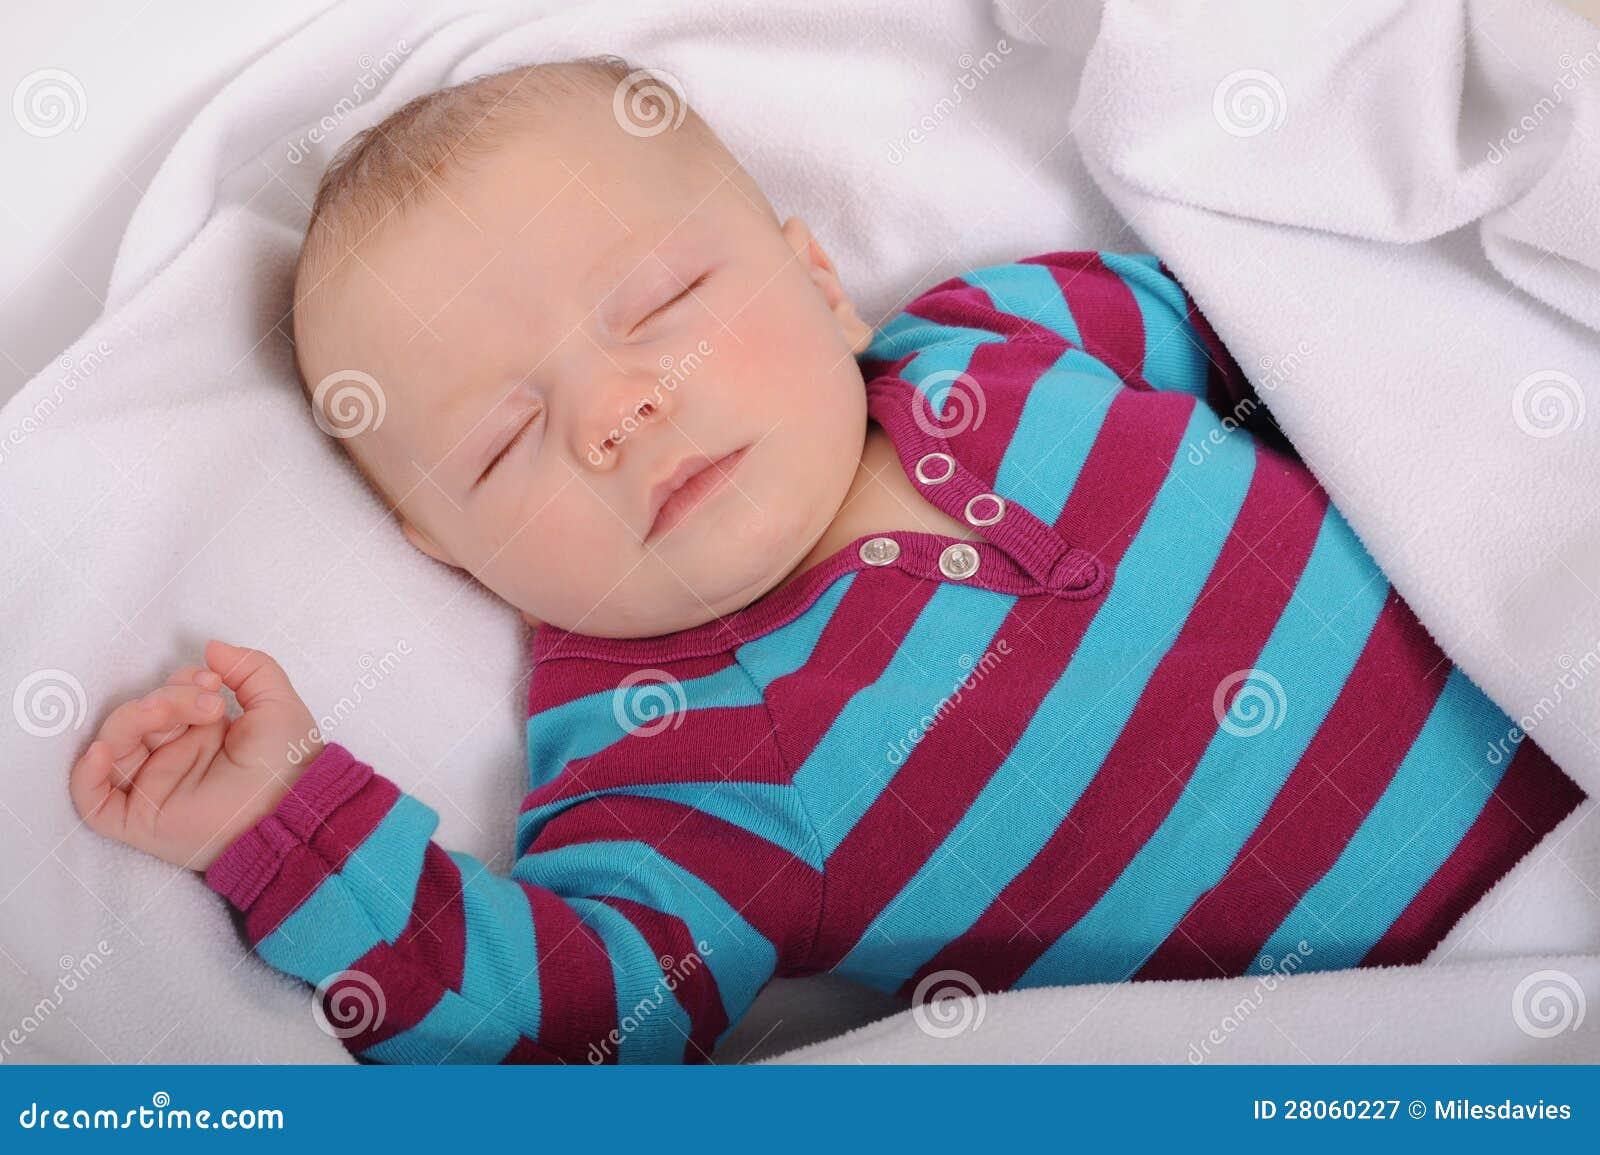 Sleeping Baby Royalty Free Stock Photography Image 28060227